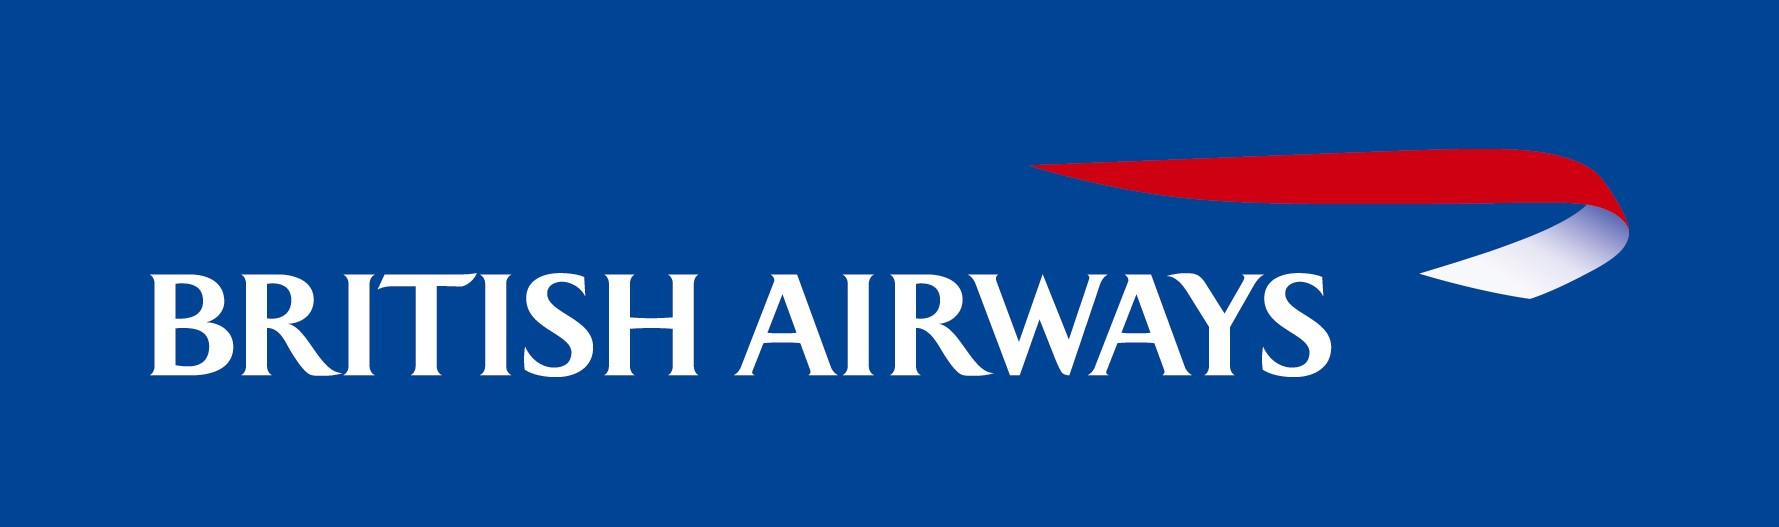 British Airways Logo PNG - 38970